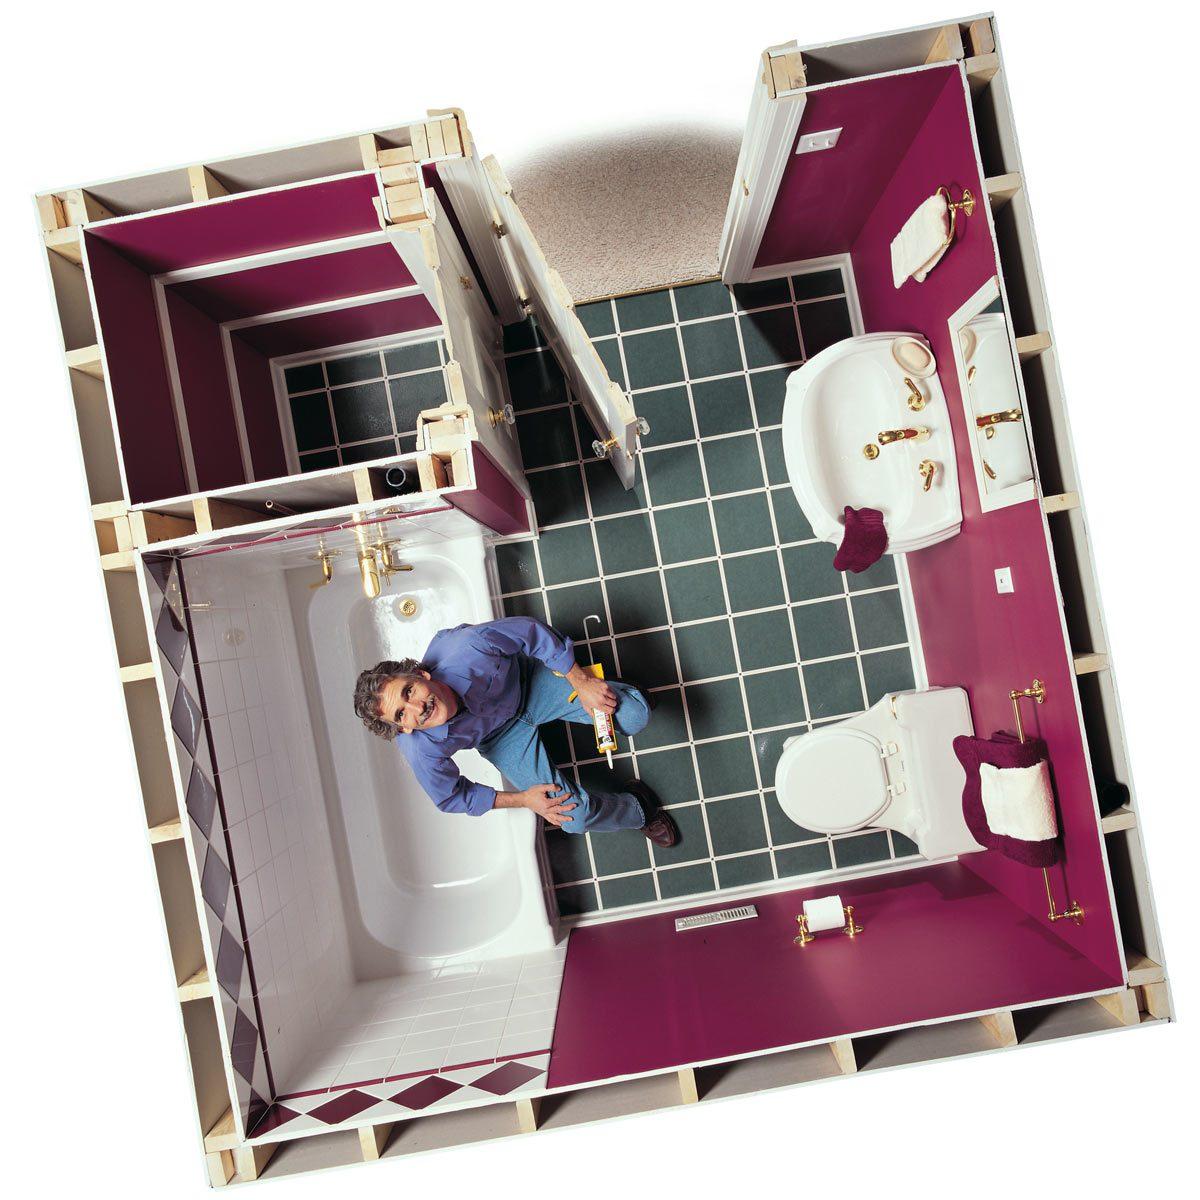 dated green laminate floors in bathroom